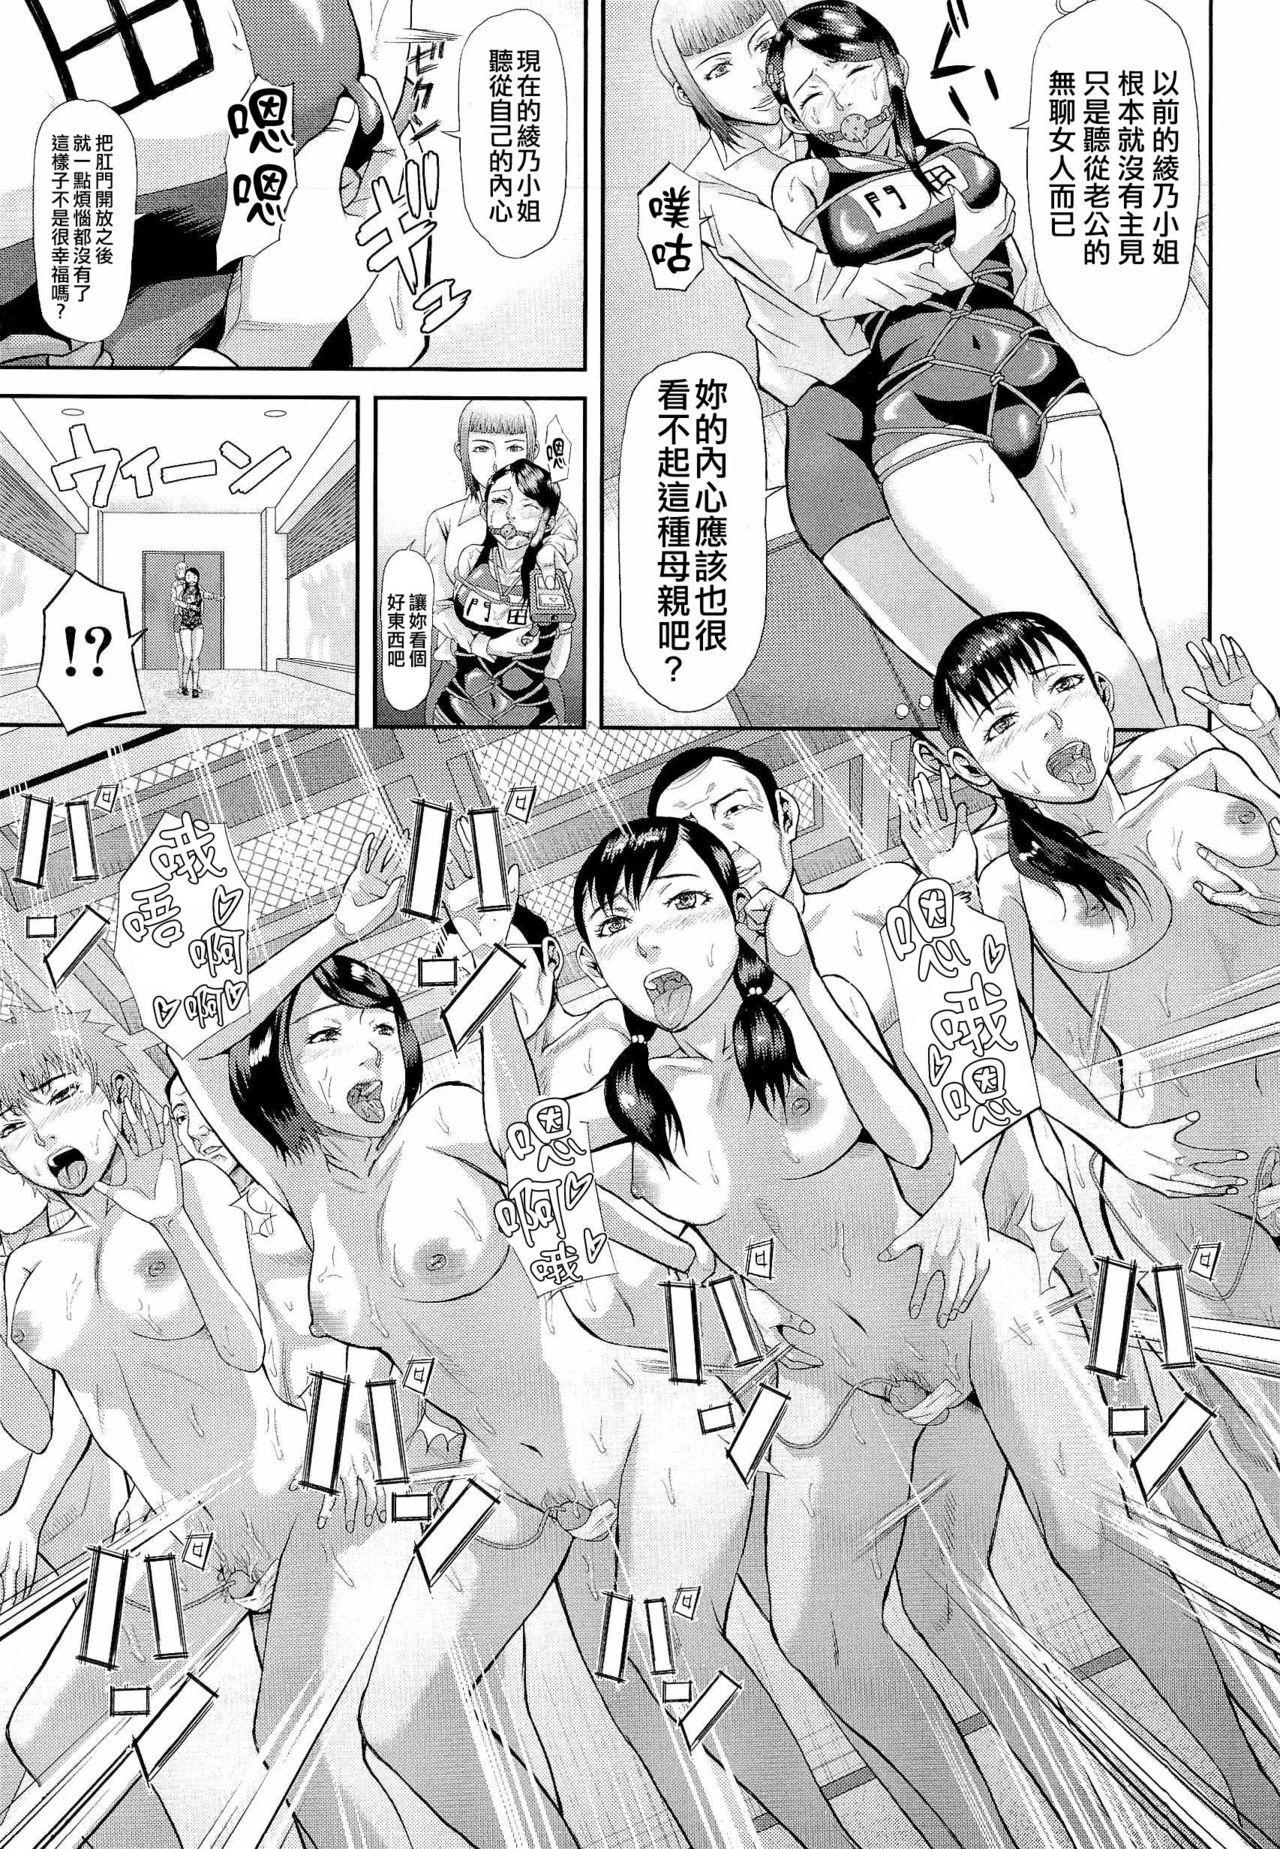 [Honebuto Danshaku] Innou Kaizou Program ~Oyako Zecchou Cult Ochi~ [Chinese]【不想记名重嵌--高质量图源】 71